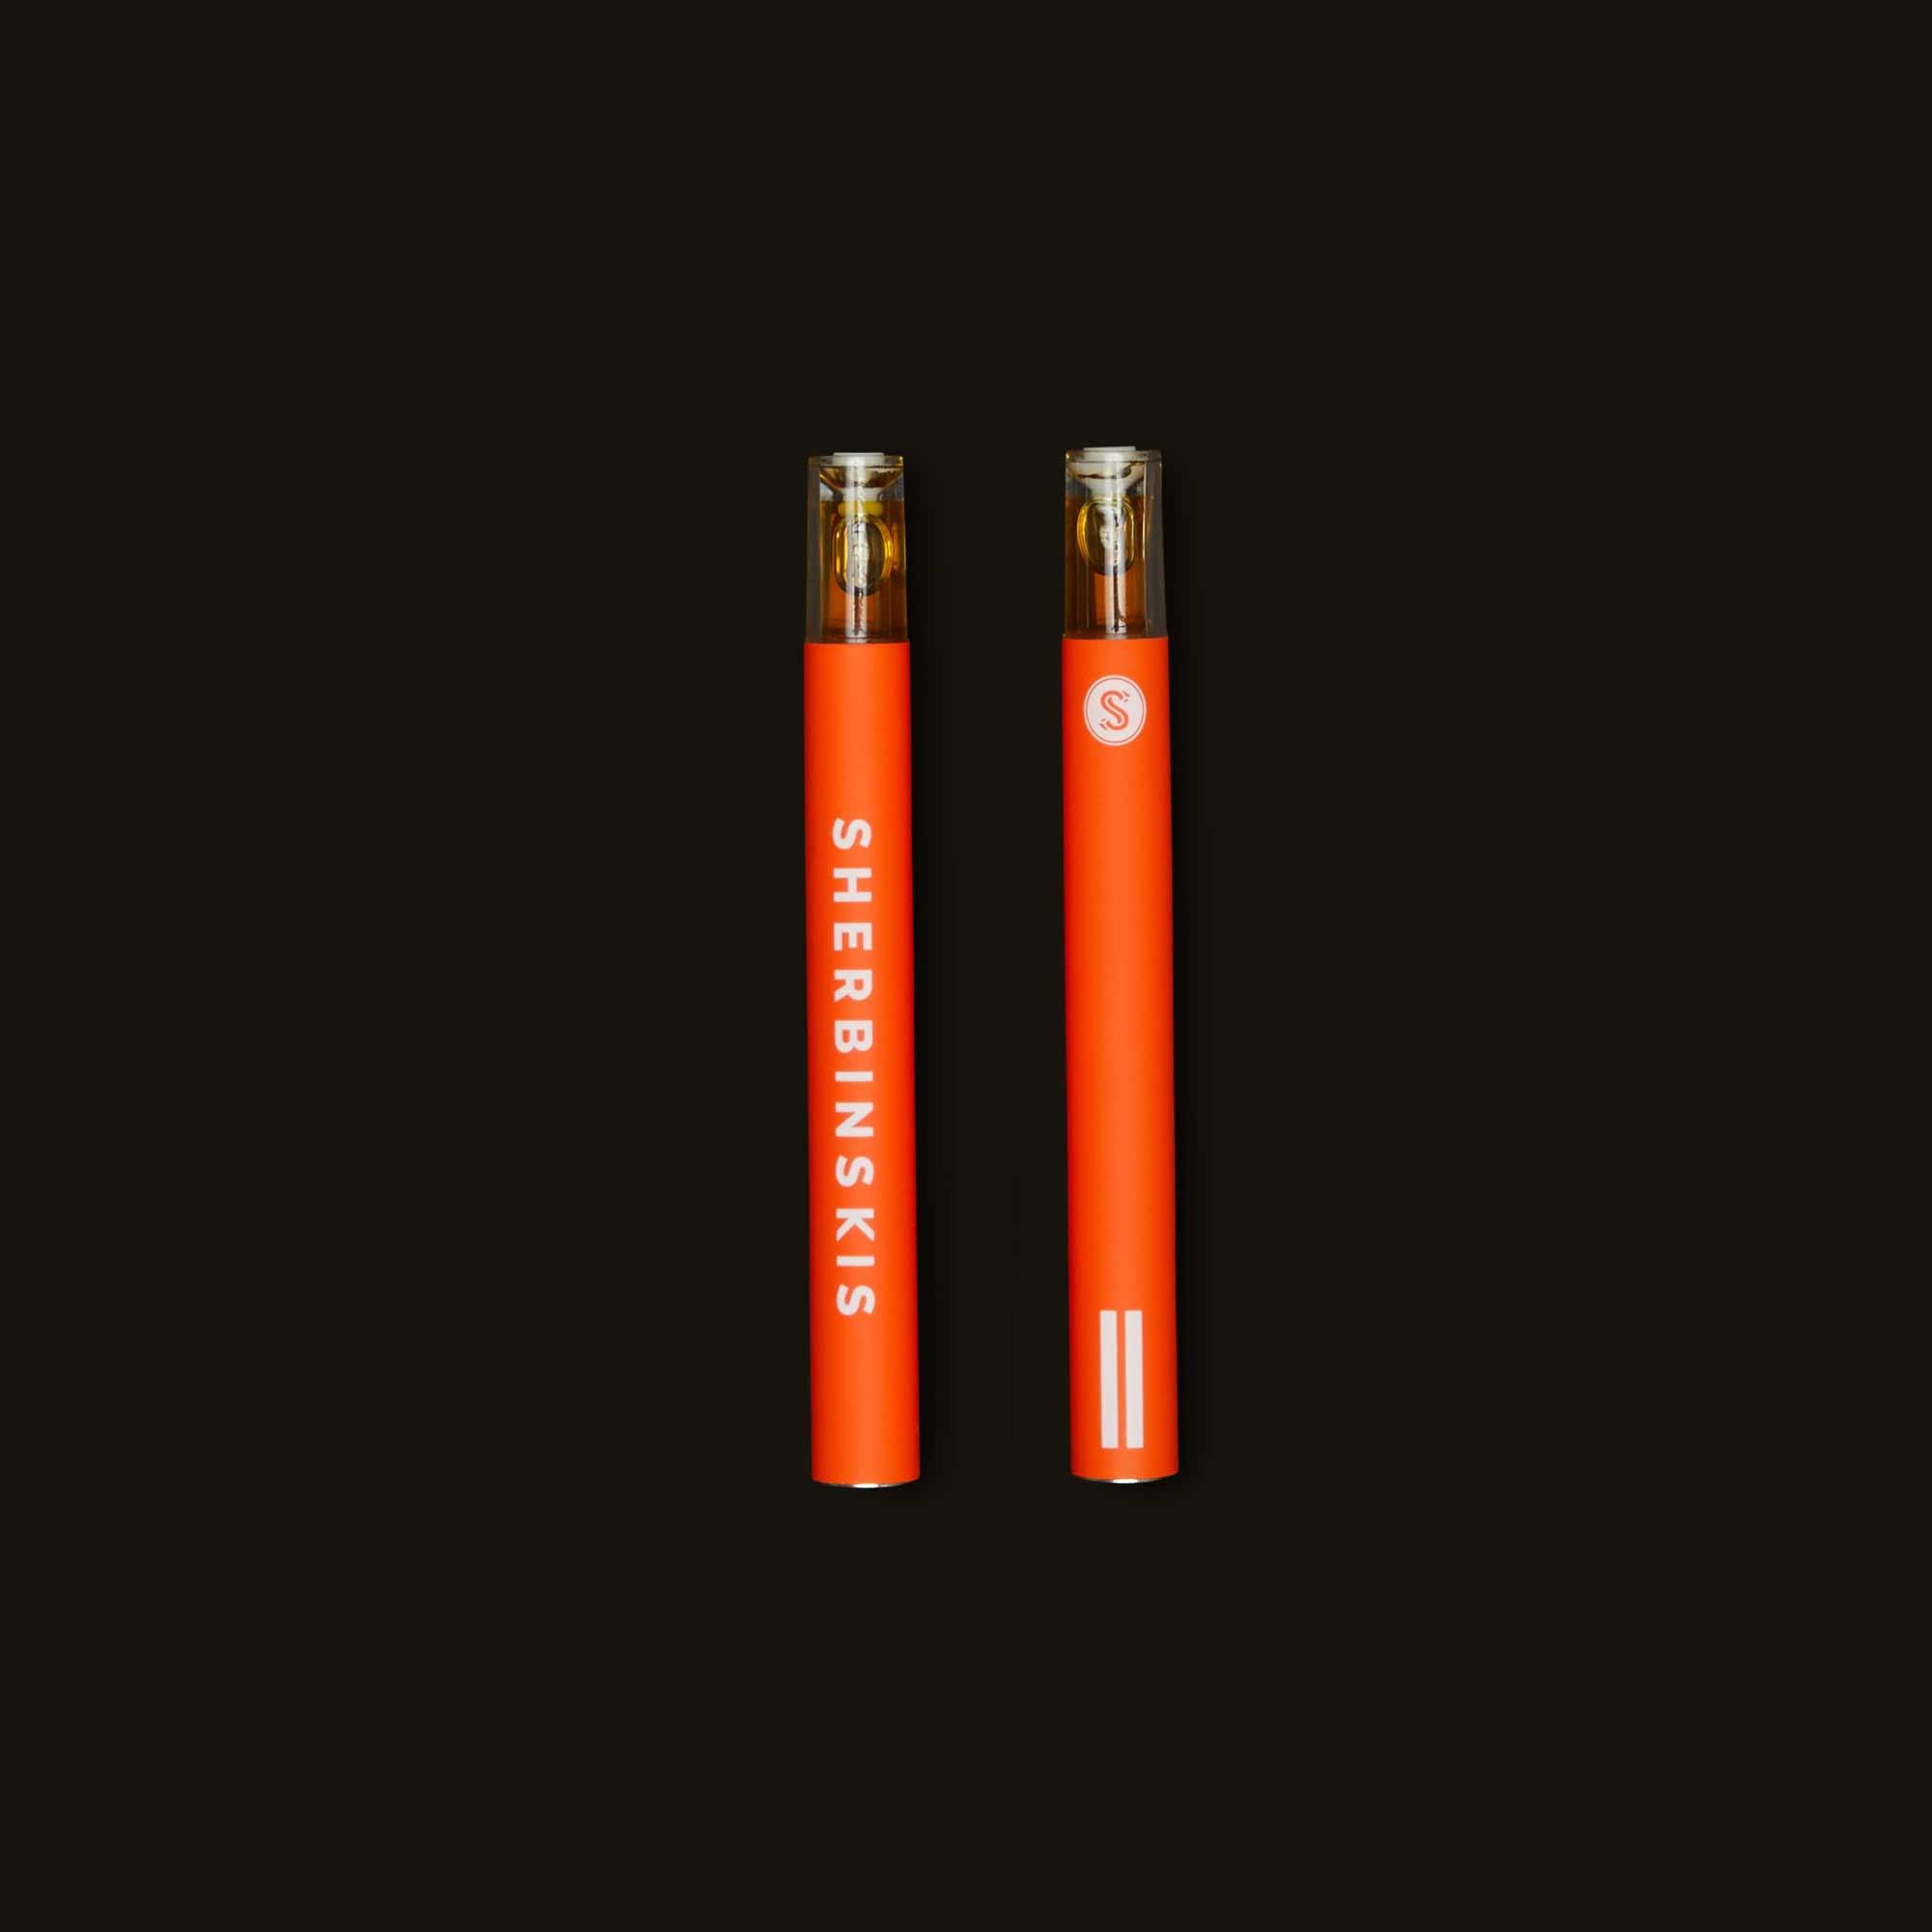 Gelato Double Barrel - Vape Pen for feeling Euphoric